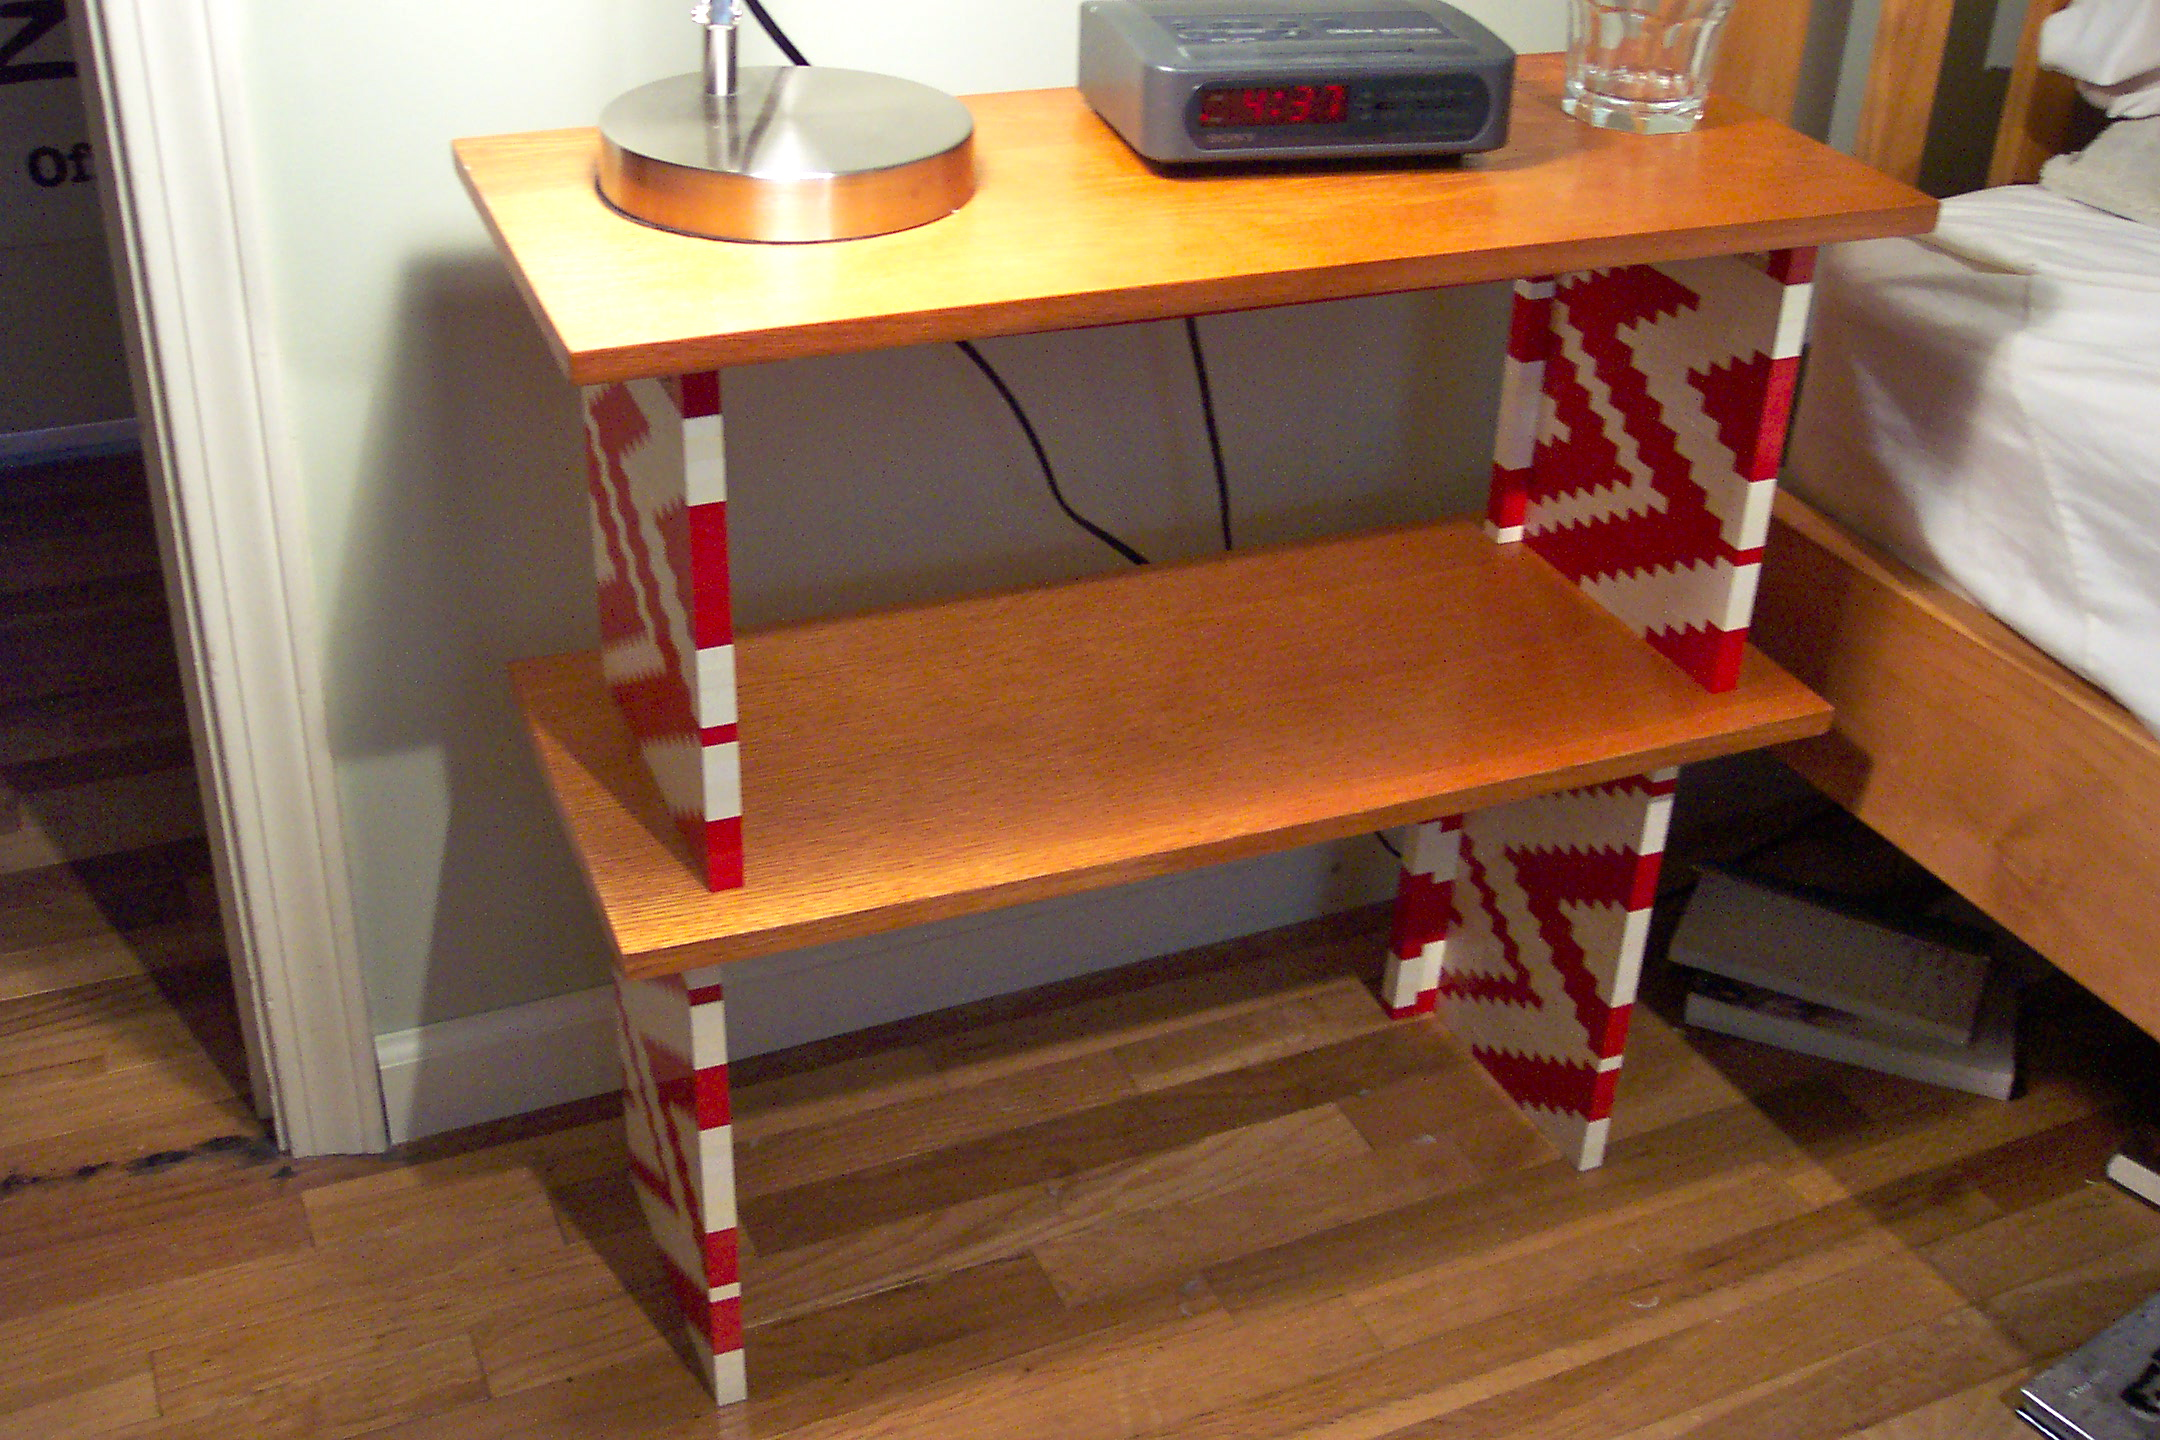 Lego & Wood Bedside Table